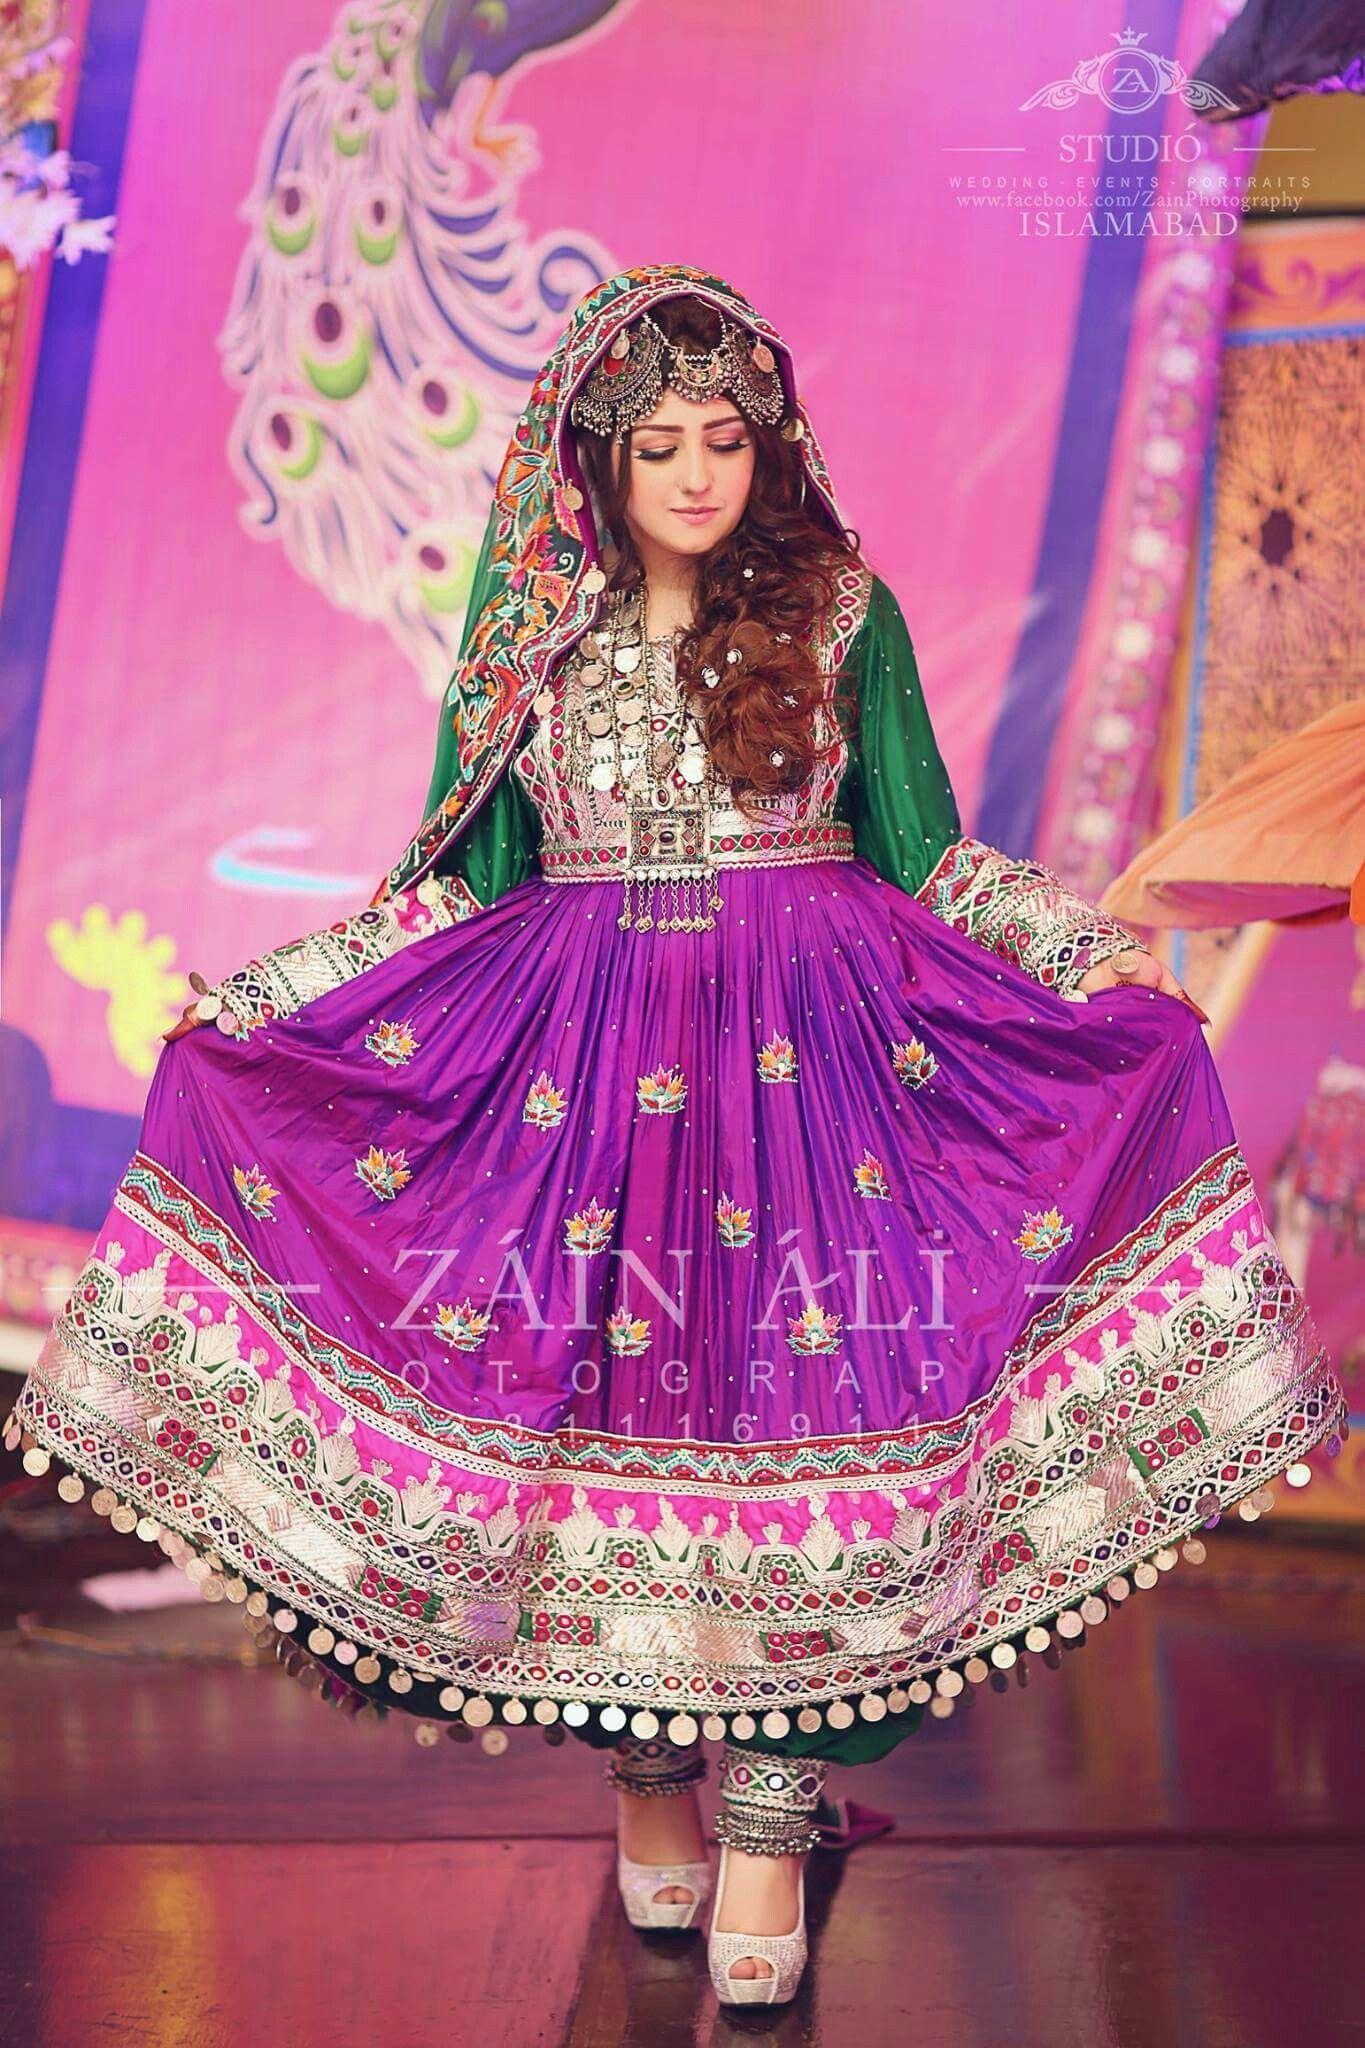 Pin de Watan Mosafer en Afghan clothes | Pinterest